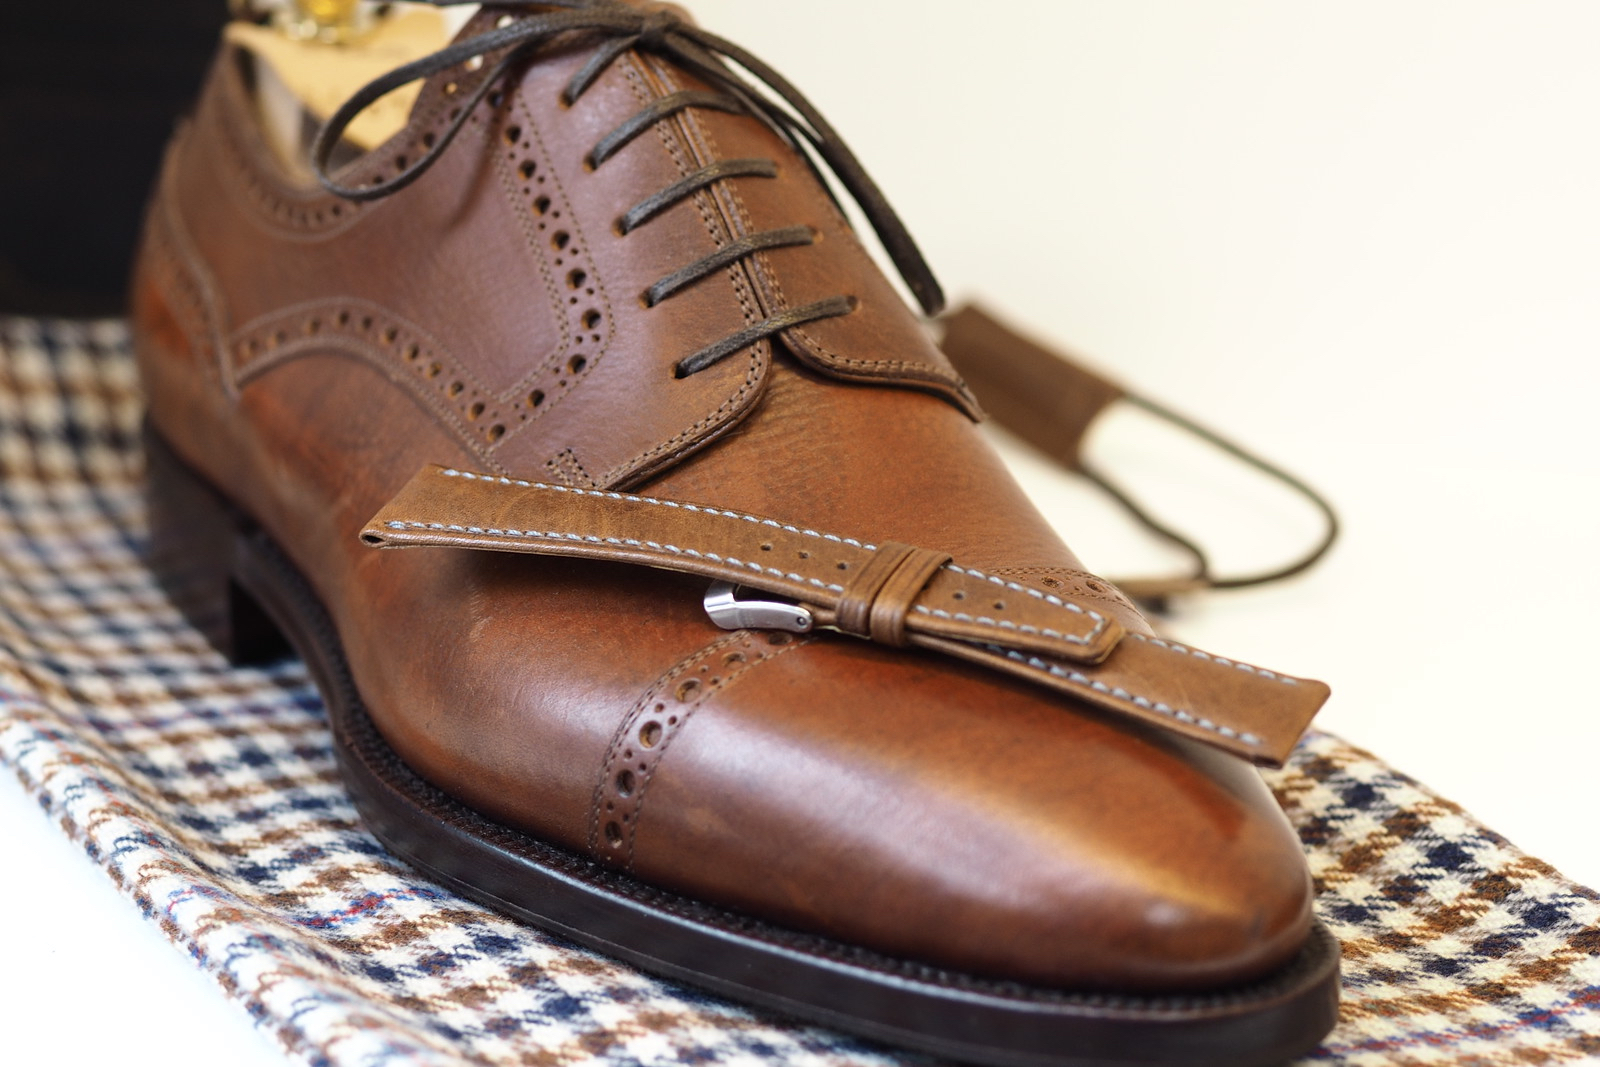 Stefano Bemer Bespoke Italian Shoes